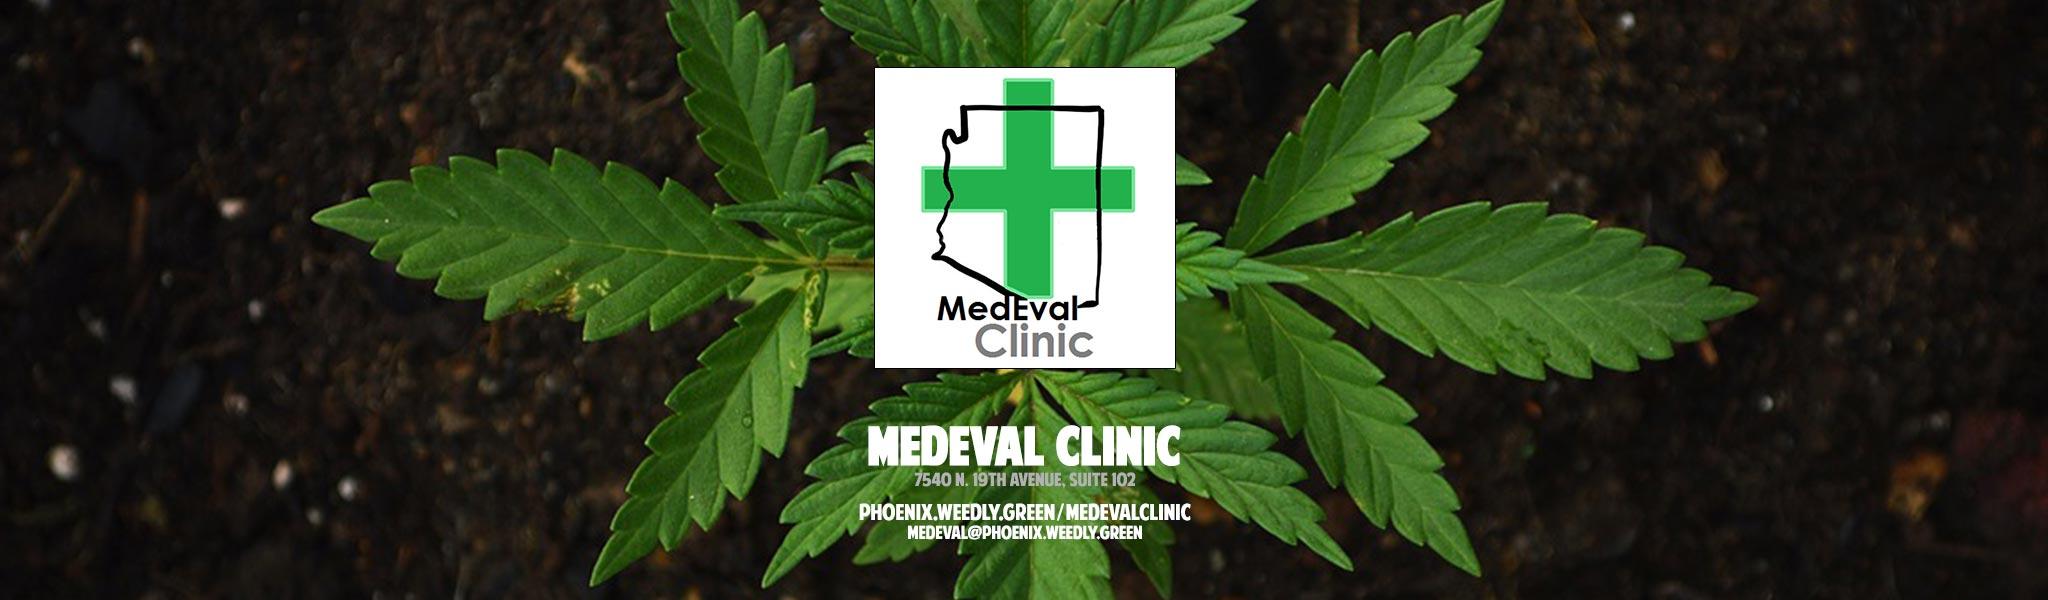 Medeval clinic phoenix arizona medical marijuana doctor medeval clinic phoenix arizona medical marijuana doctor certification 1betcityfo Gallery